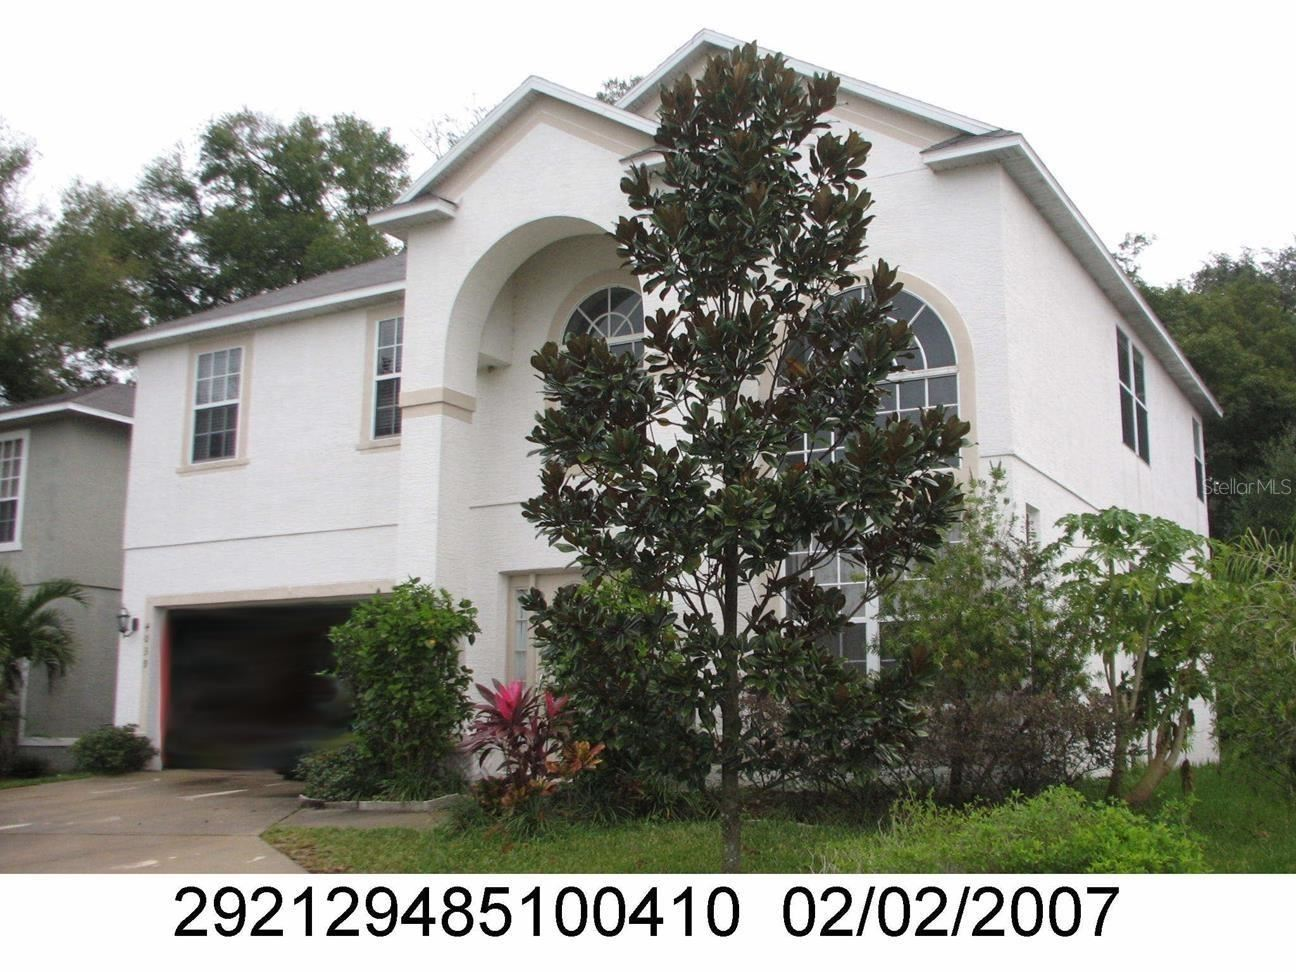 4039 LAKESIDE RESERVE COURT, Orlando, FL 32810 - #: O5980549